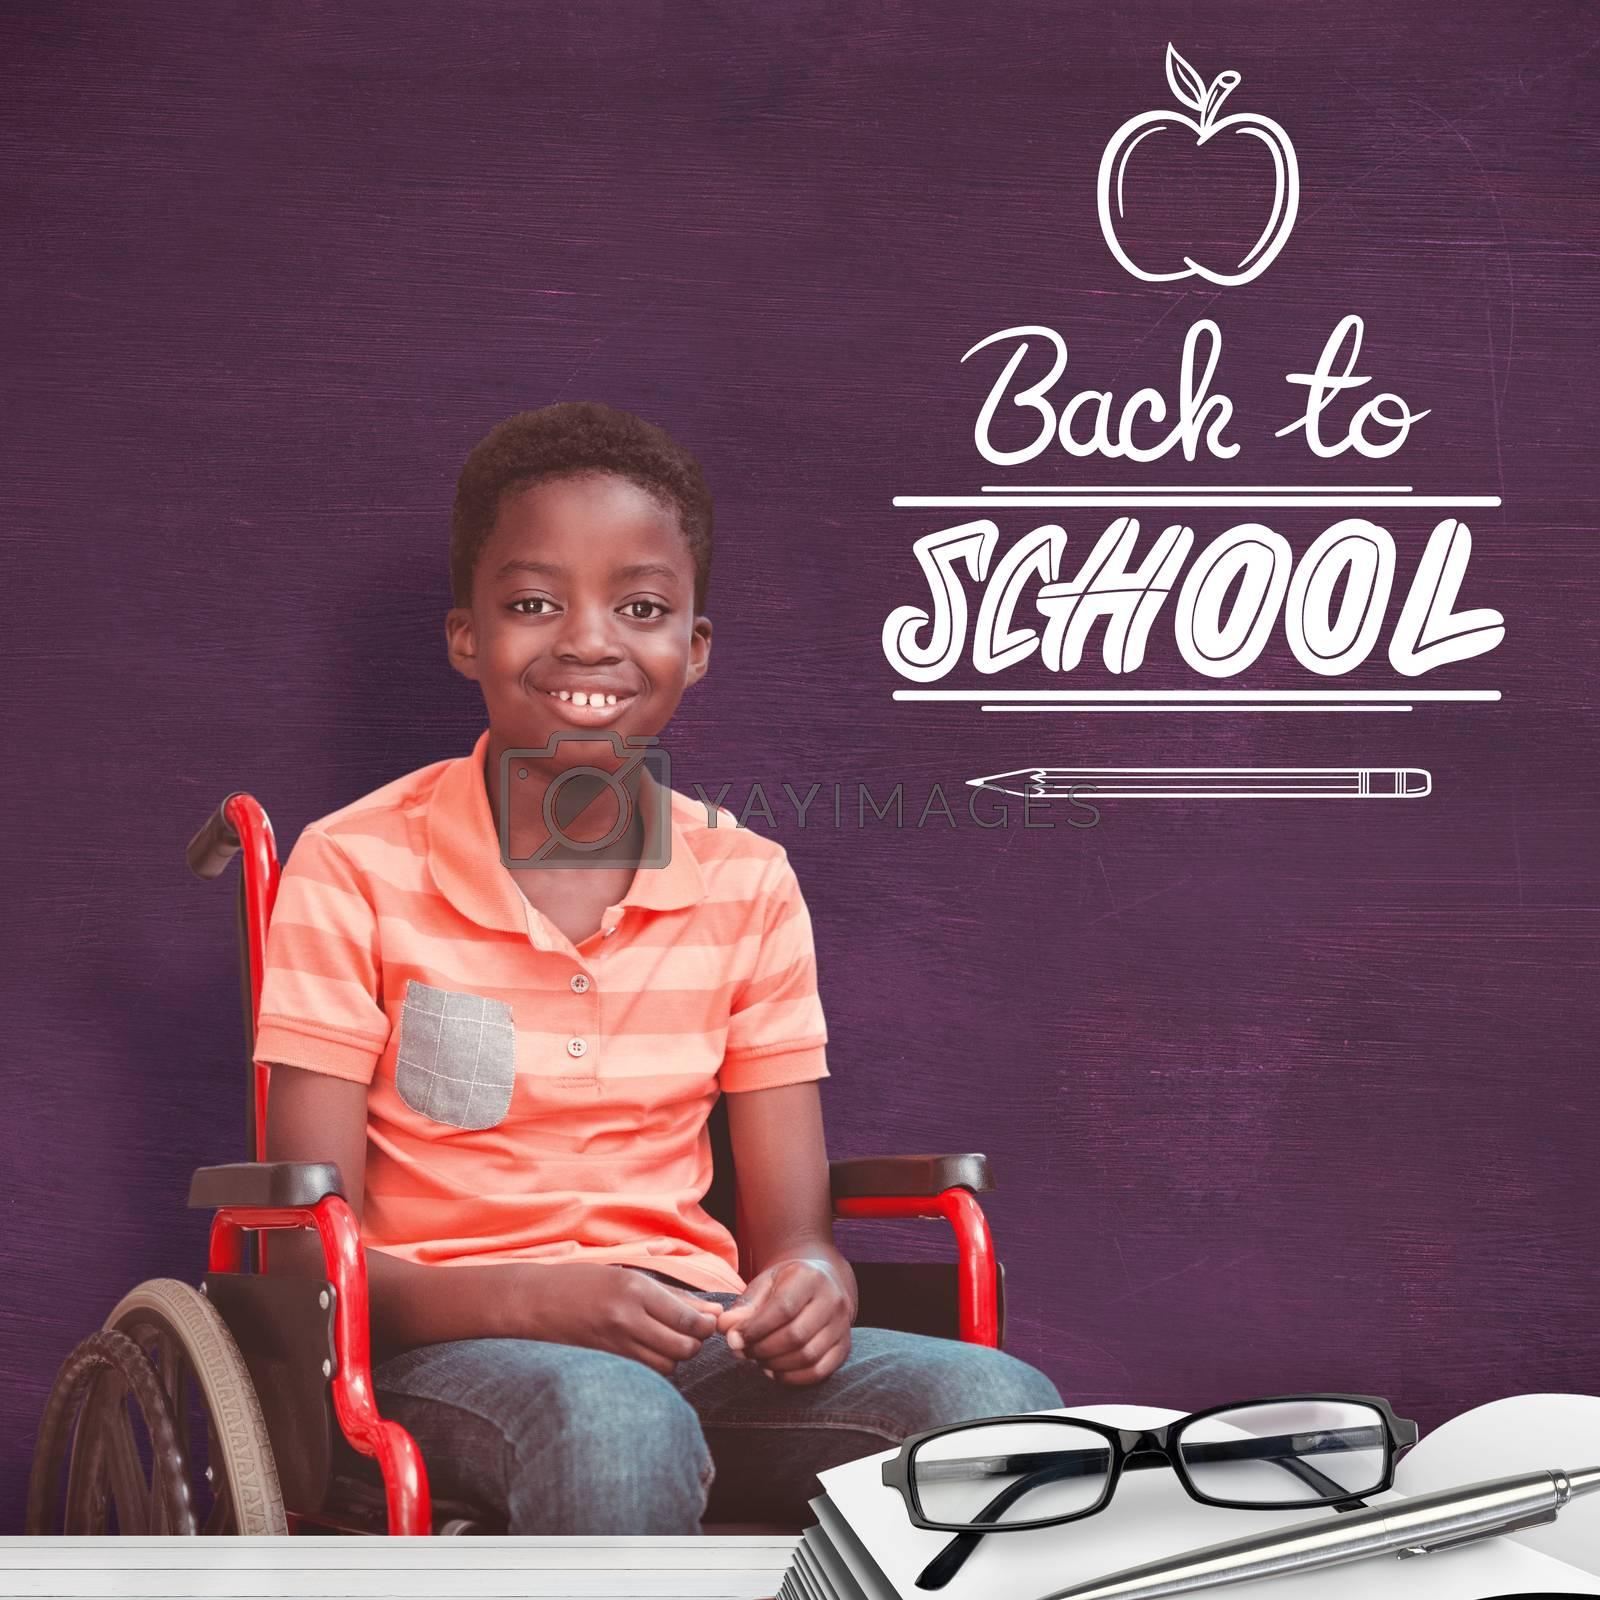 Full length portrait of happy boy on wheelchair against green chalkboard